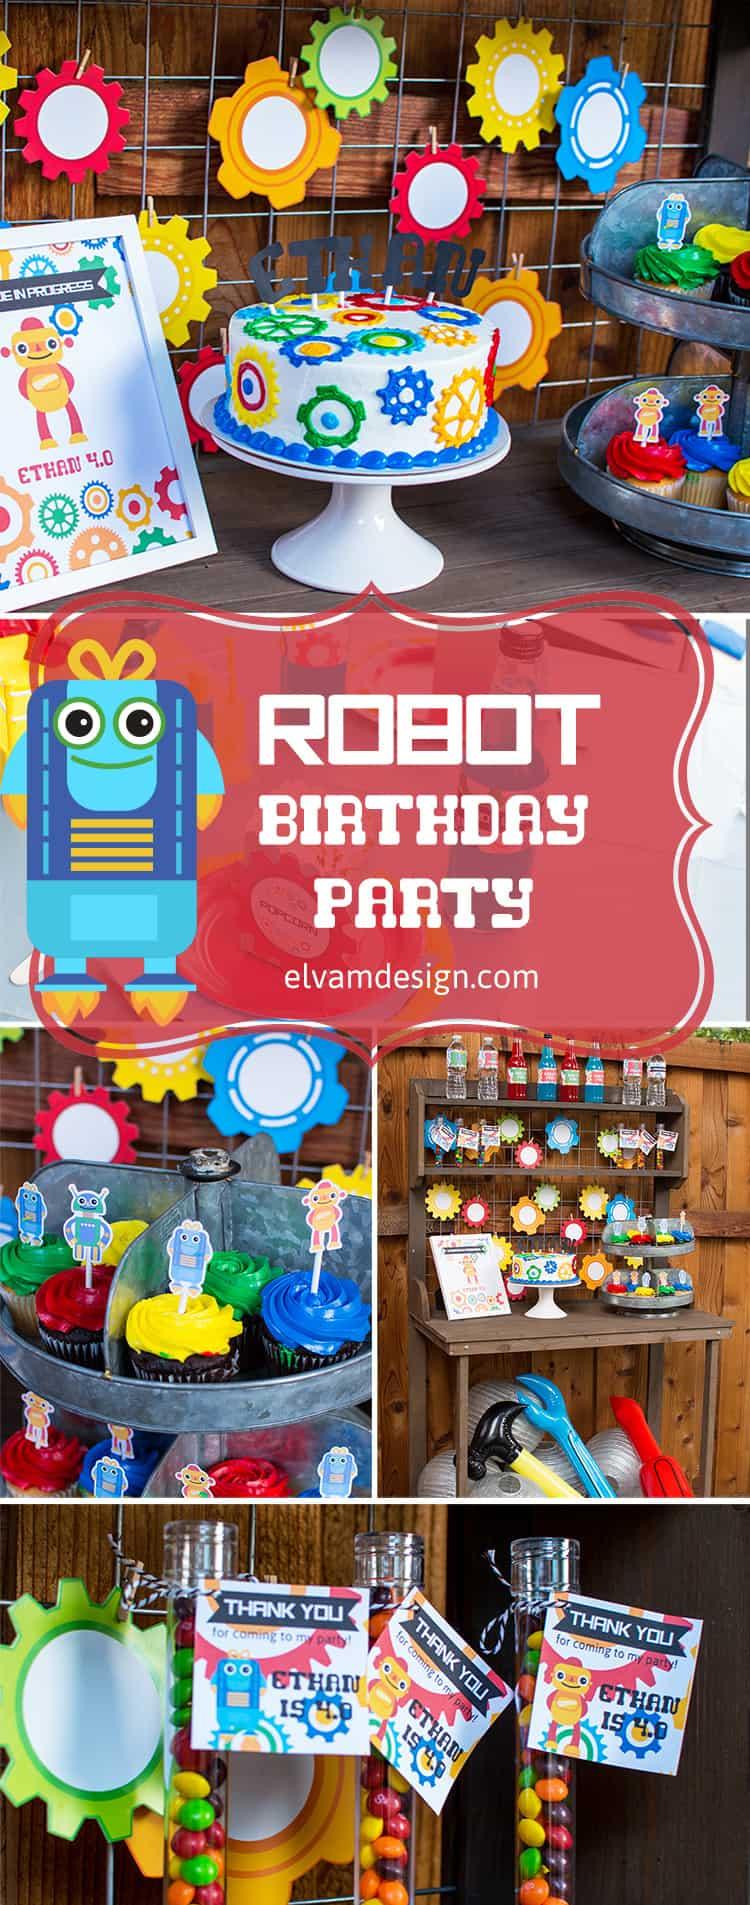 Robot Birthday Party styled by Elva M Design Studio